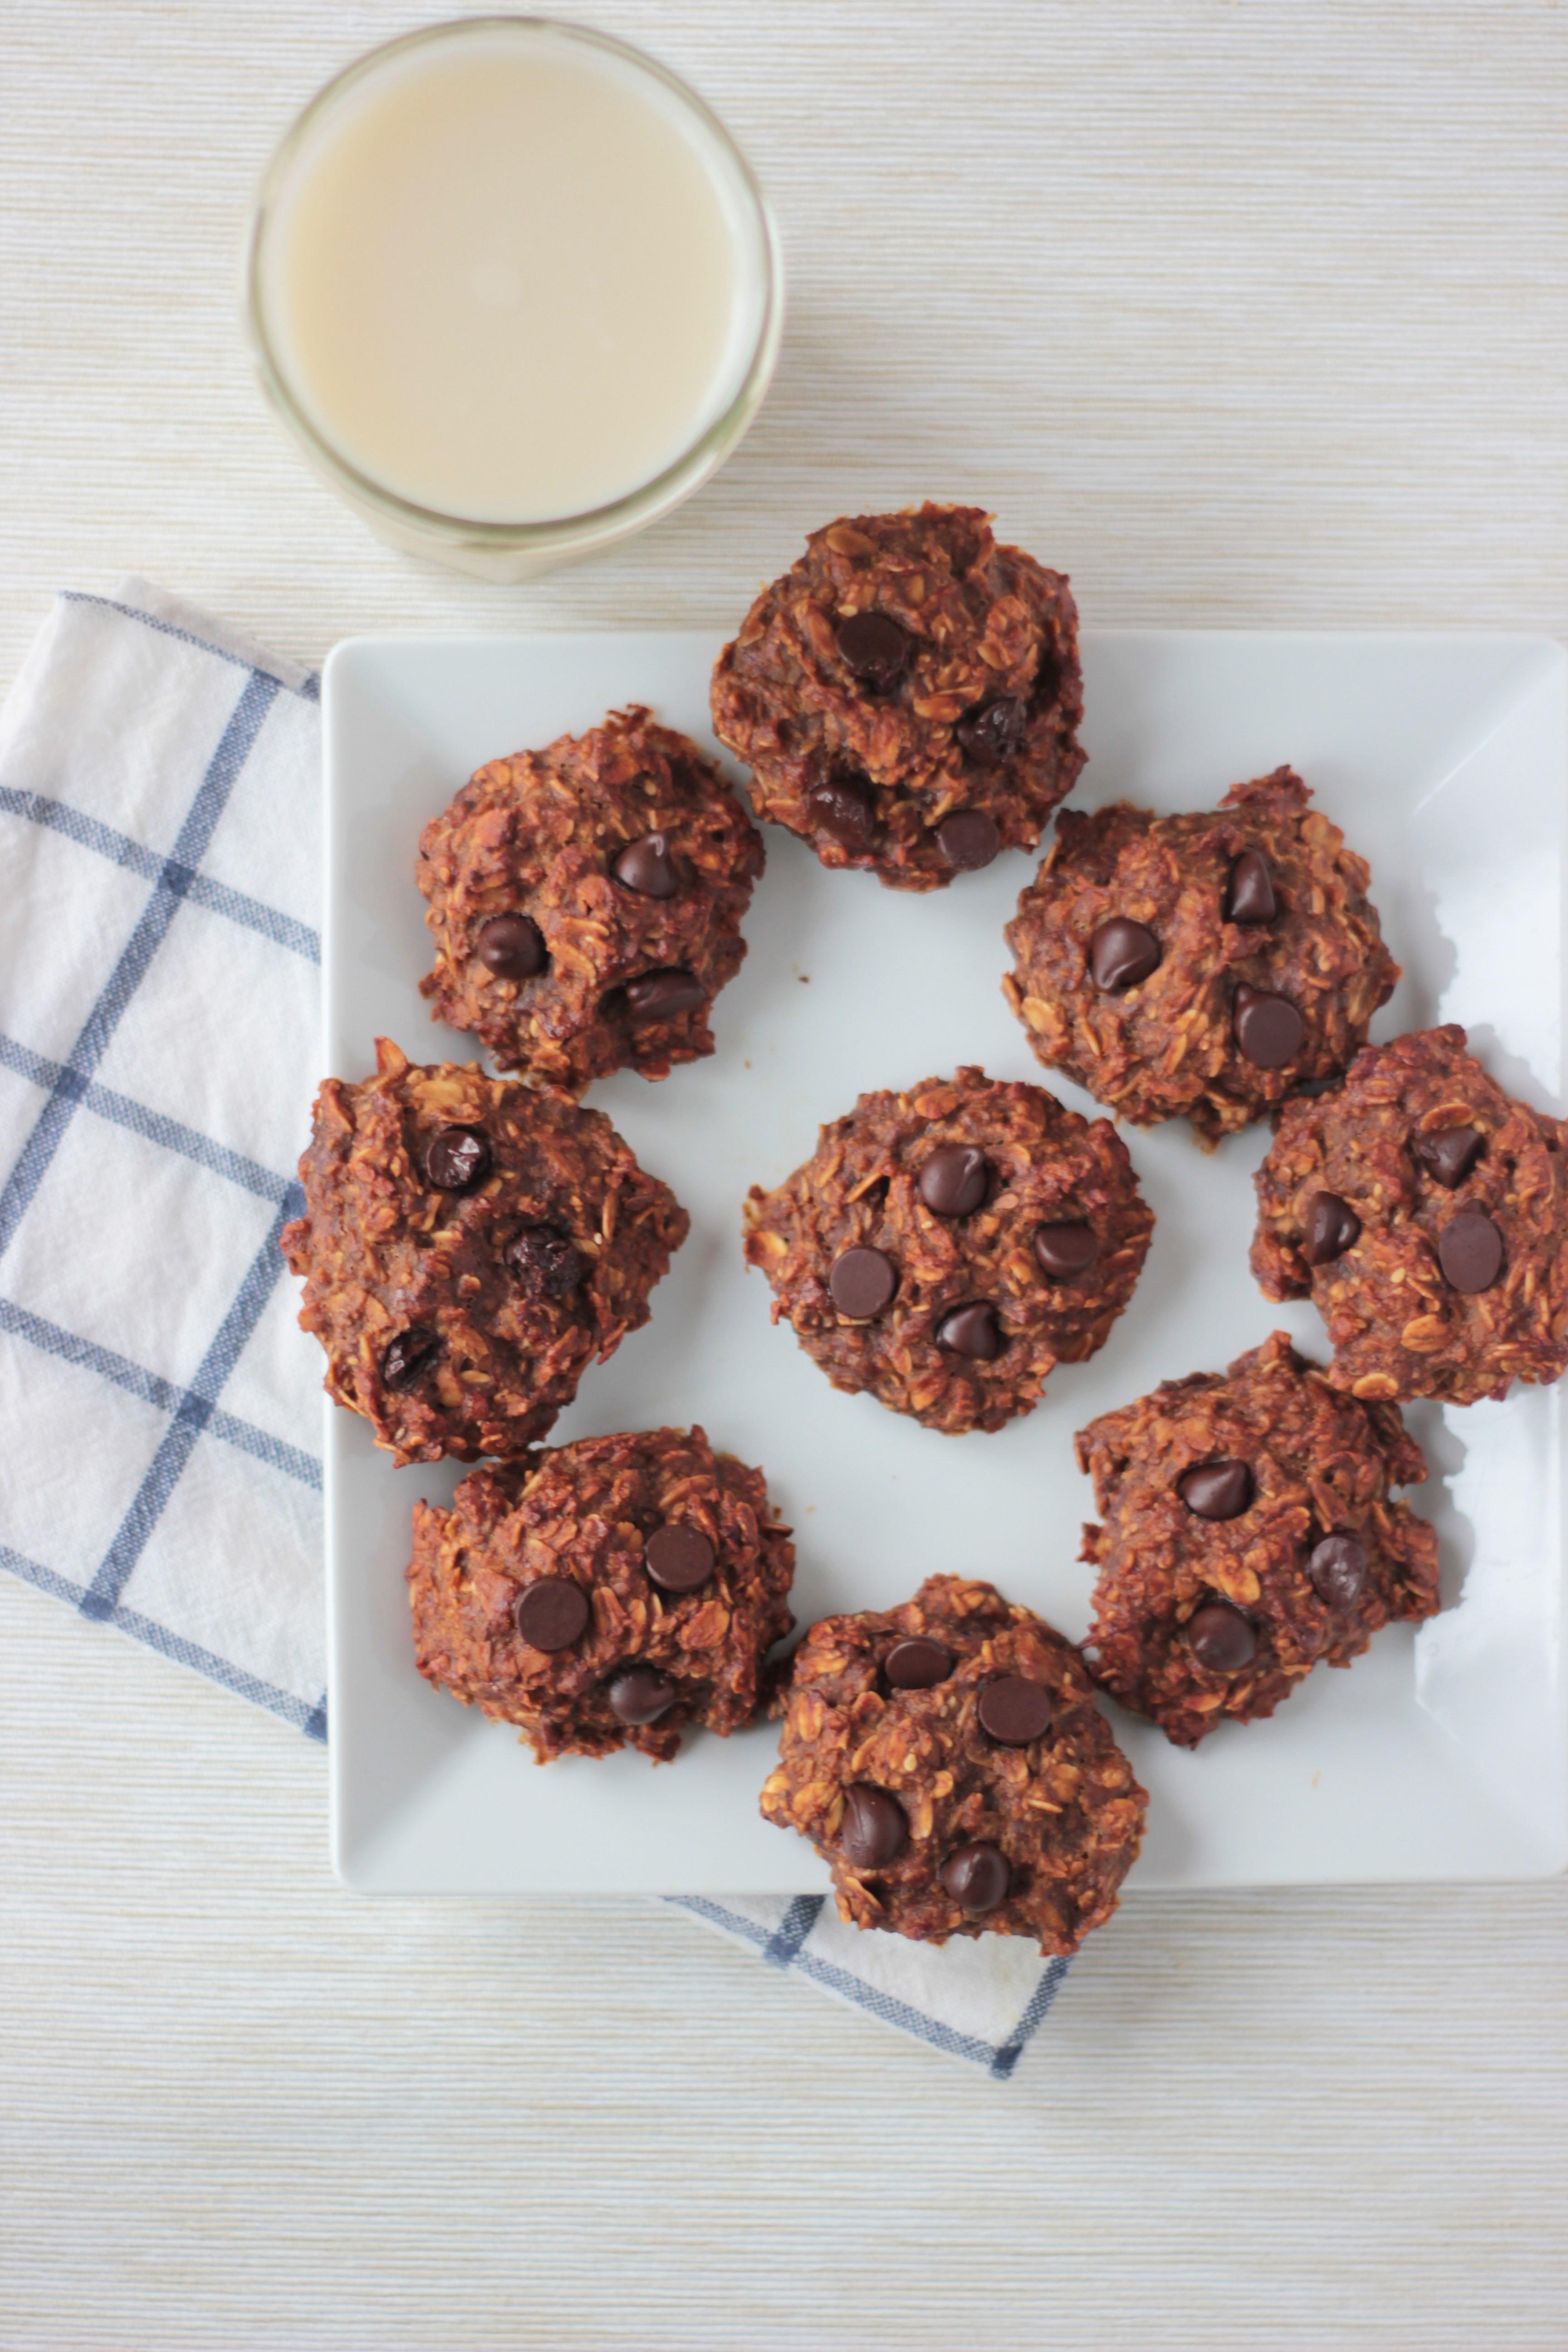 Healthy Breakfast Cookies  Healthy e Bowl Breakfast Cookies the vegan ginger